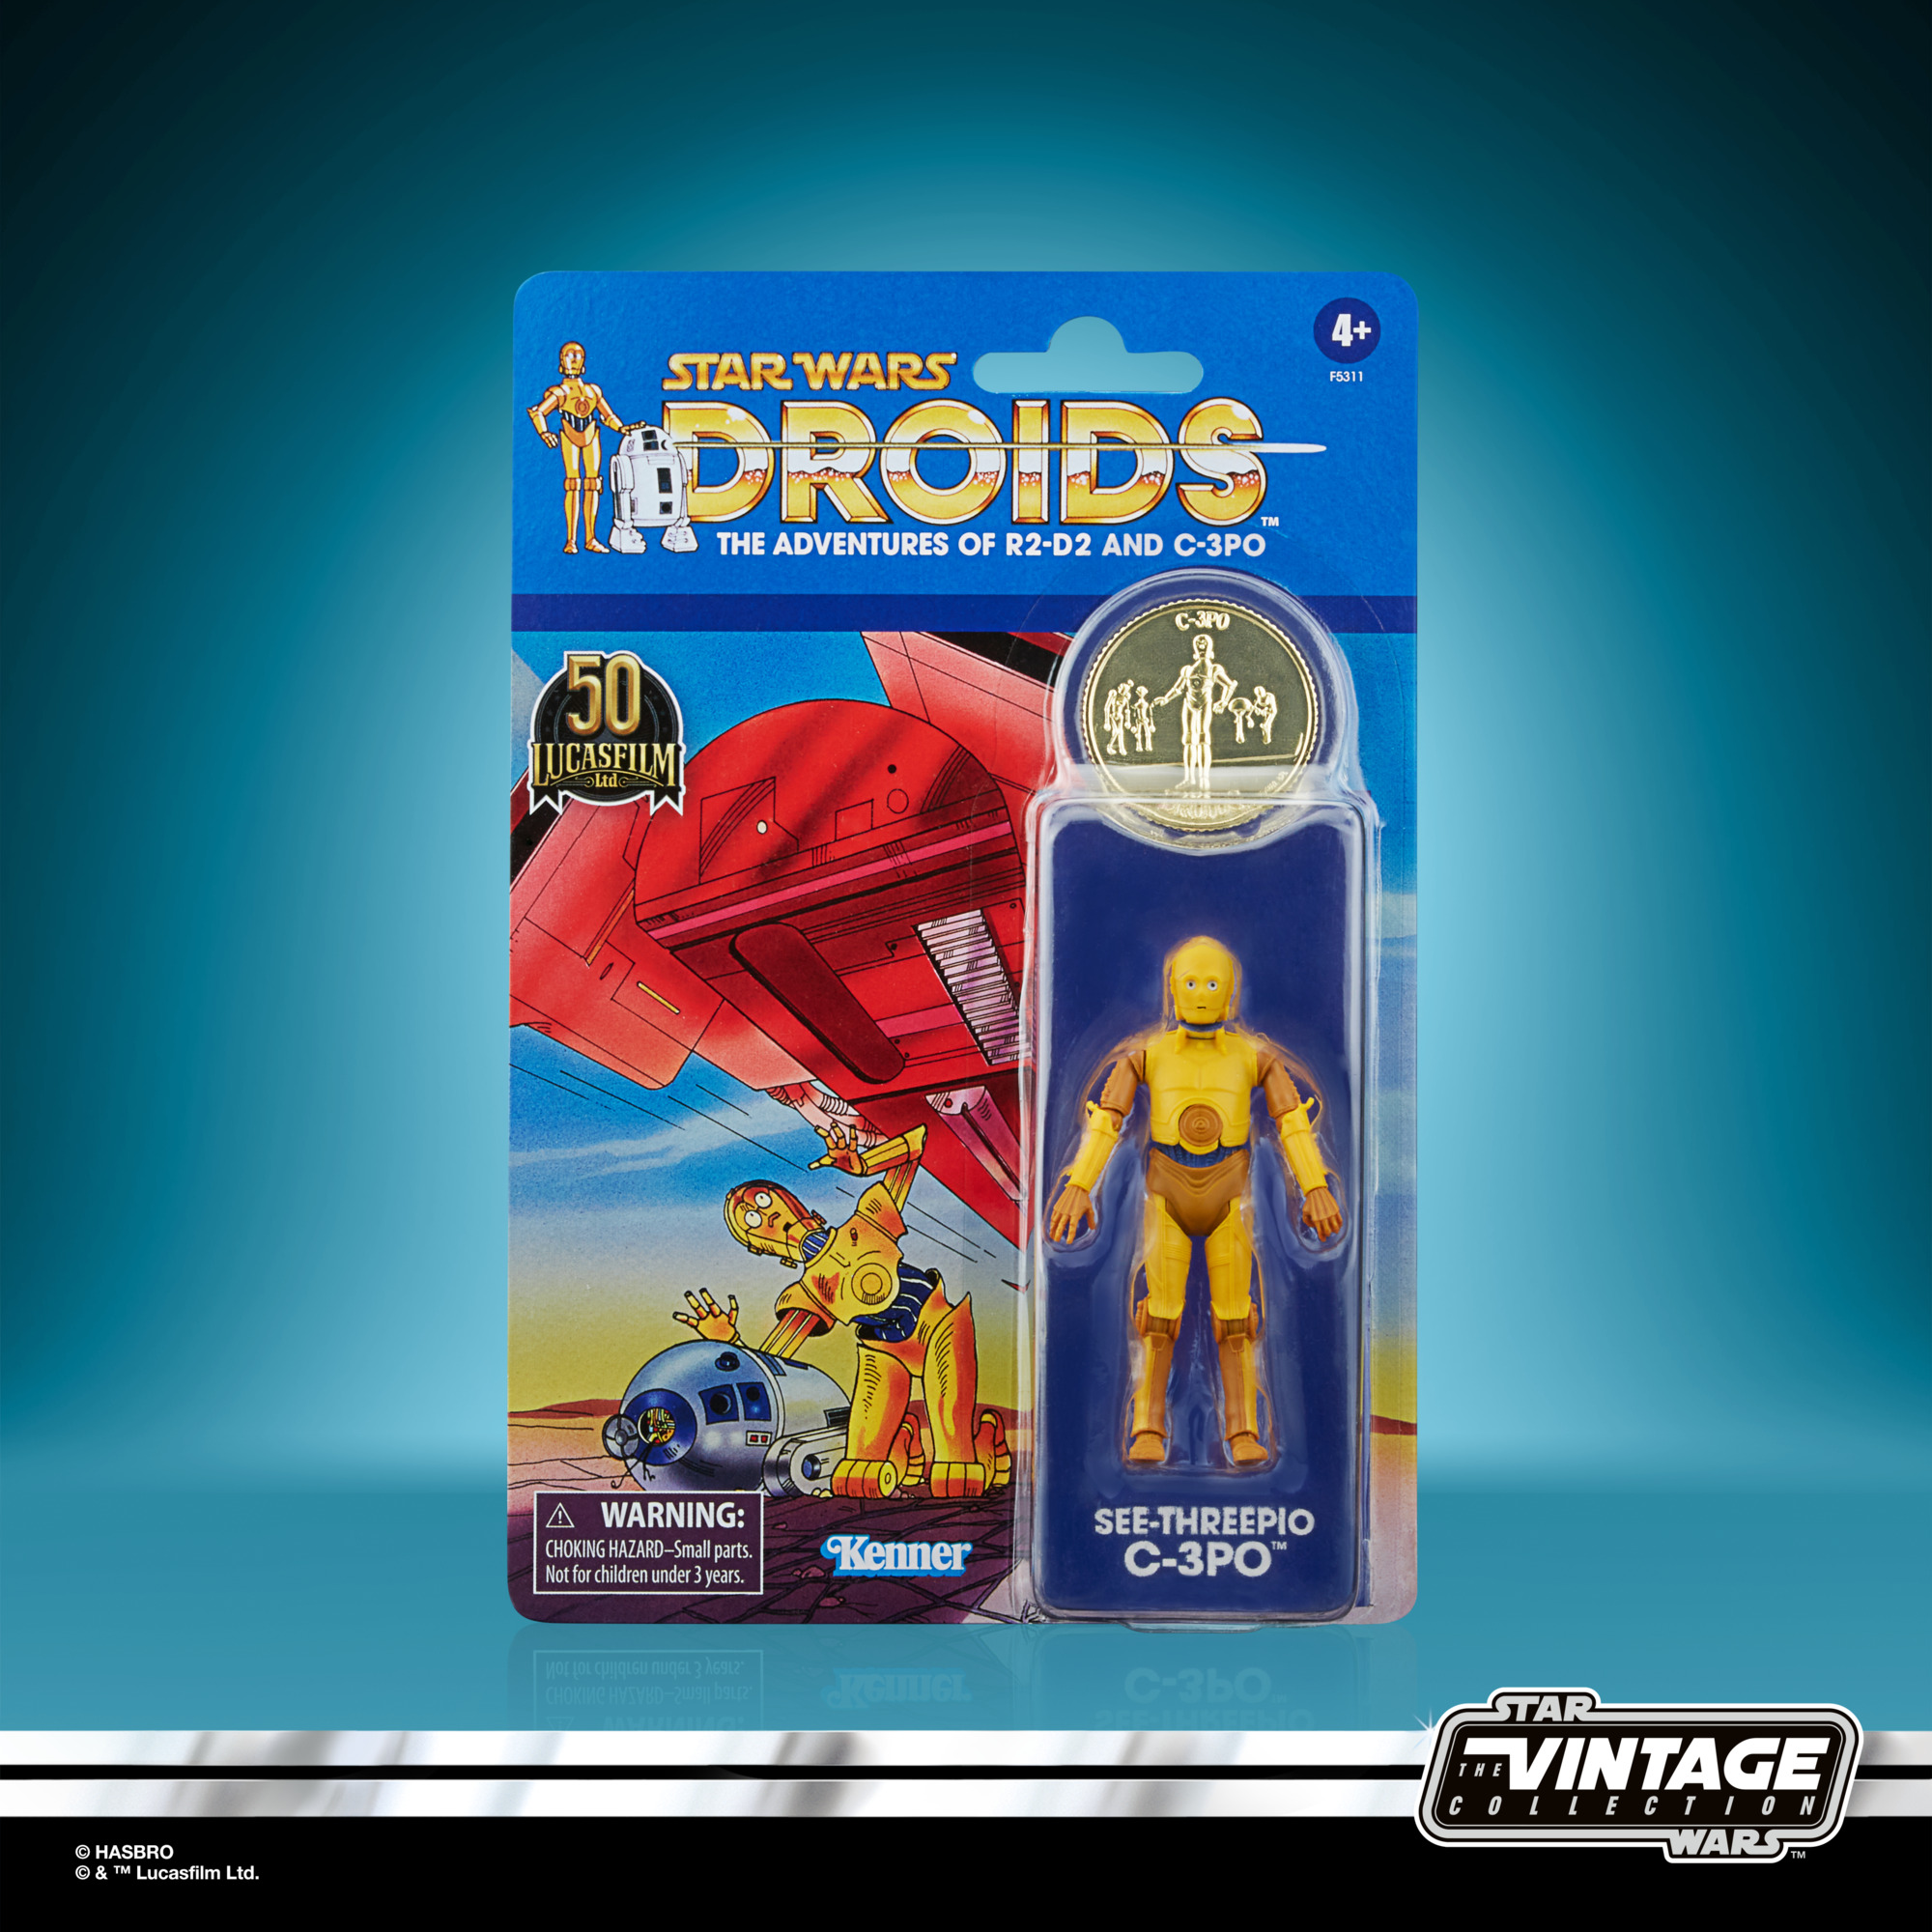 Star Wars: Droids Vintage Collection Actionfigur 2021 See-Threepio (C-3PO) 10 cm F53115L00 5010993953899